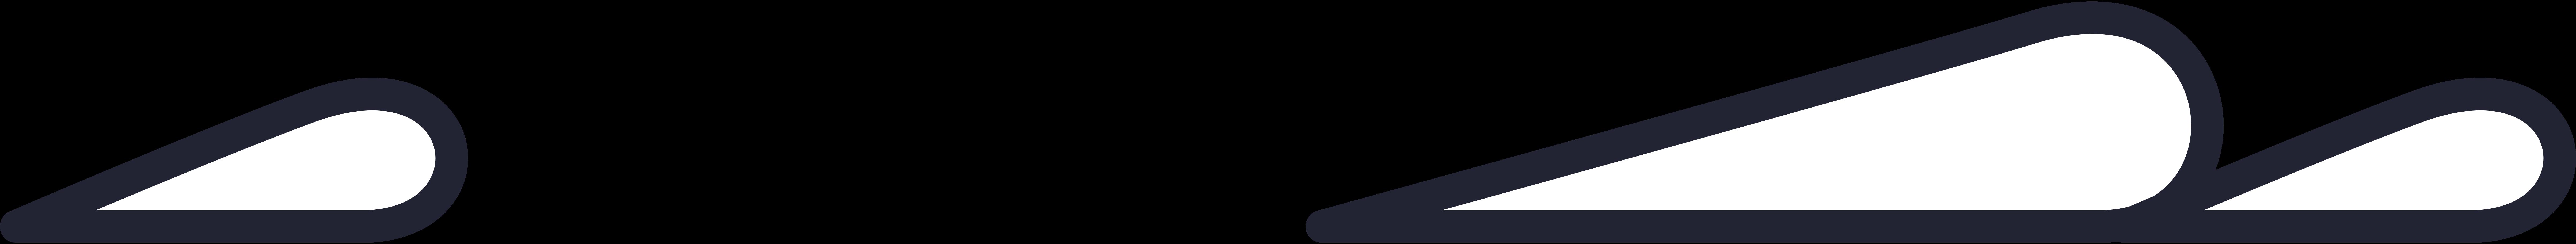 car rental  dust white Clipart illustration in PNG, SVG